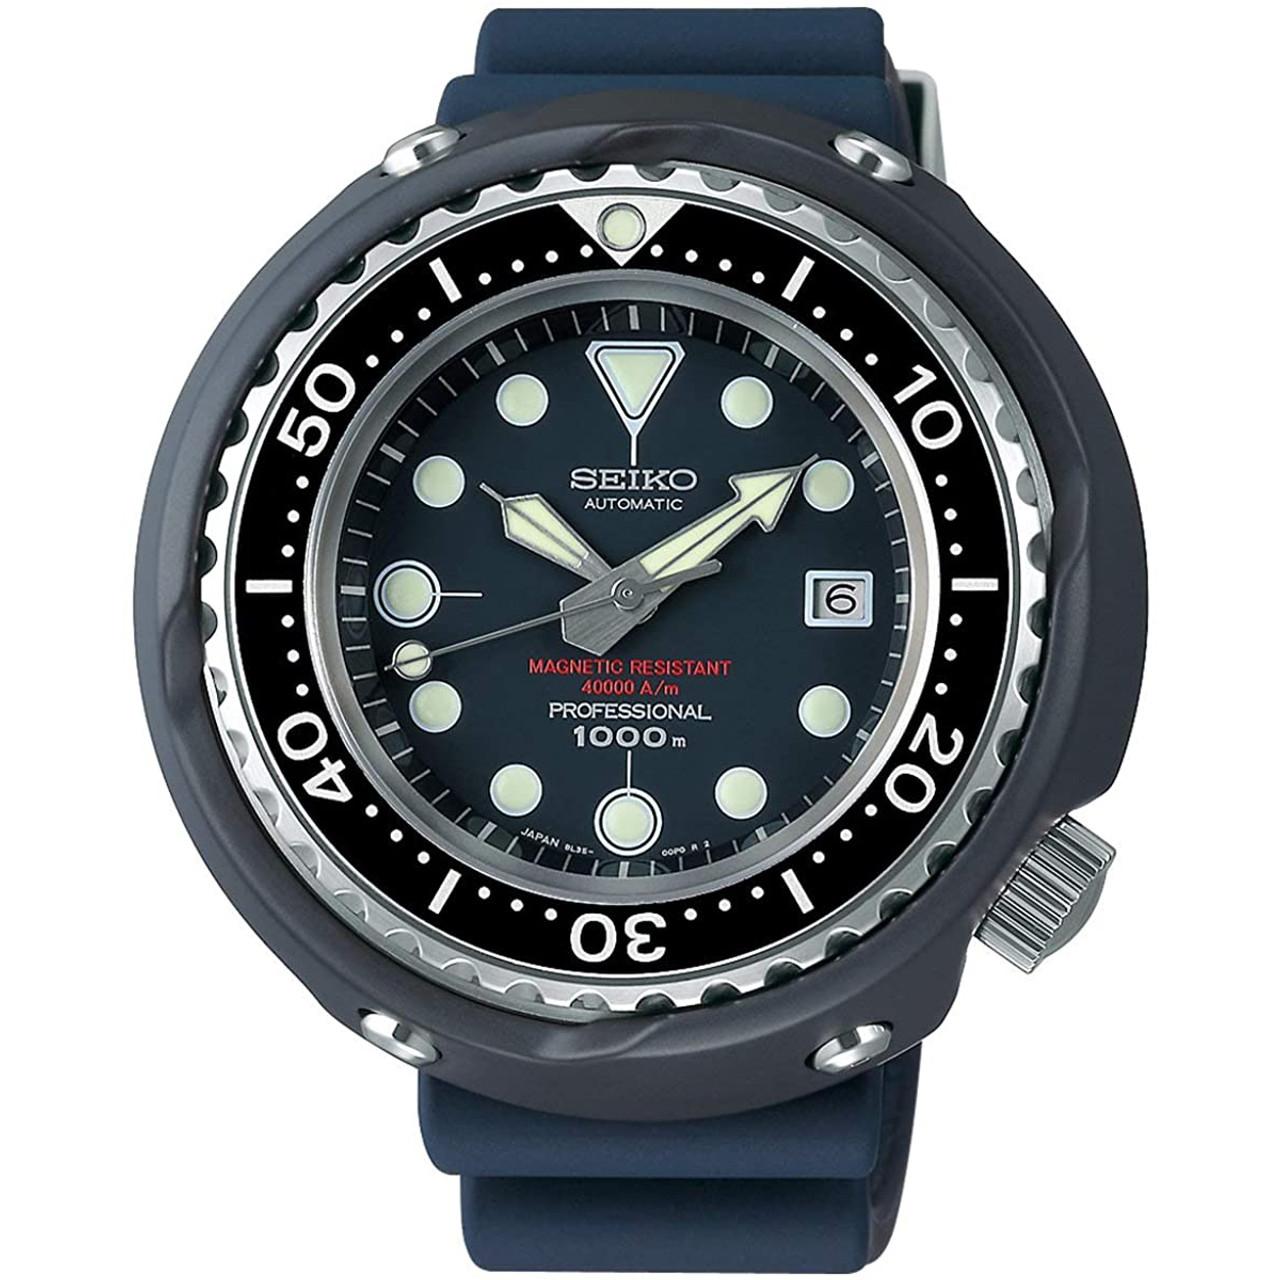 Seiko 1975 Professional Diver Limited SBDX035 / SLA041